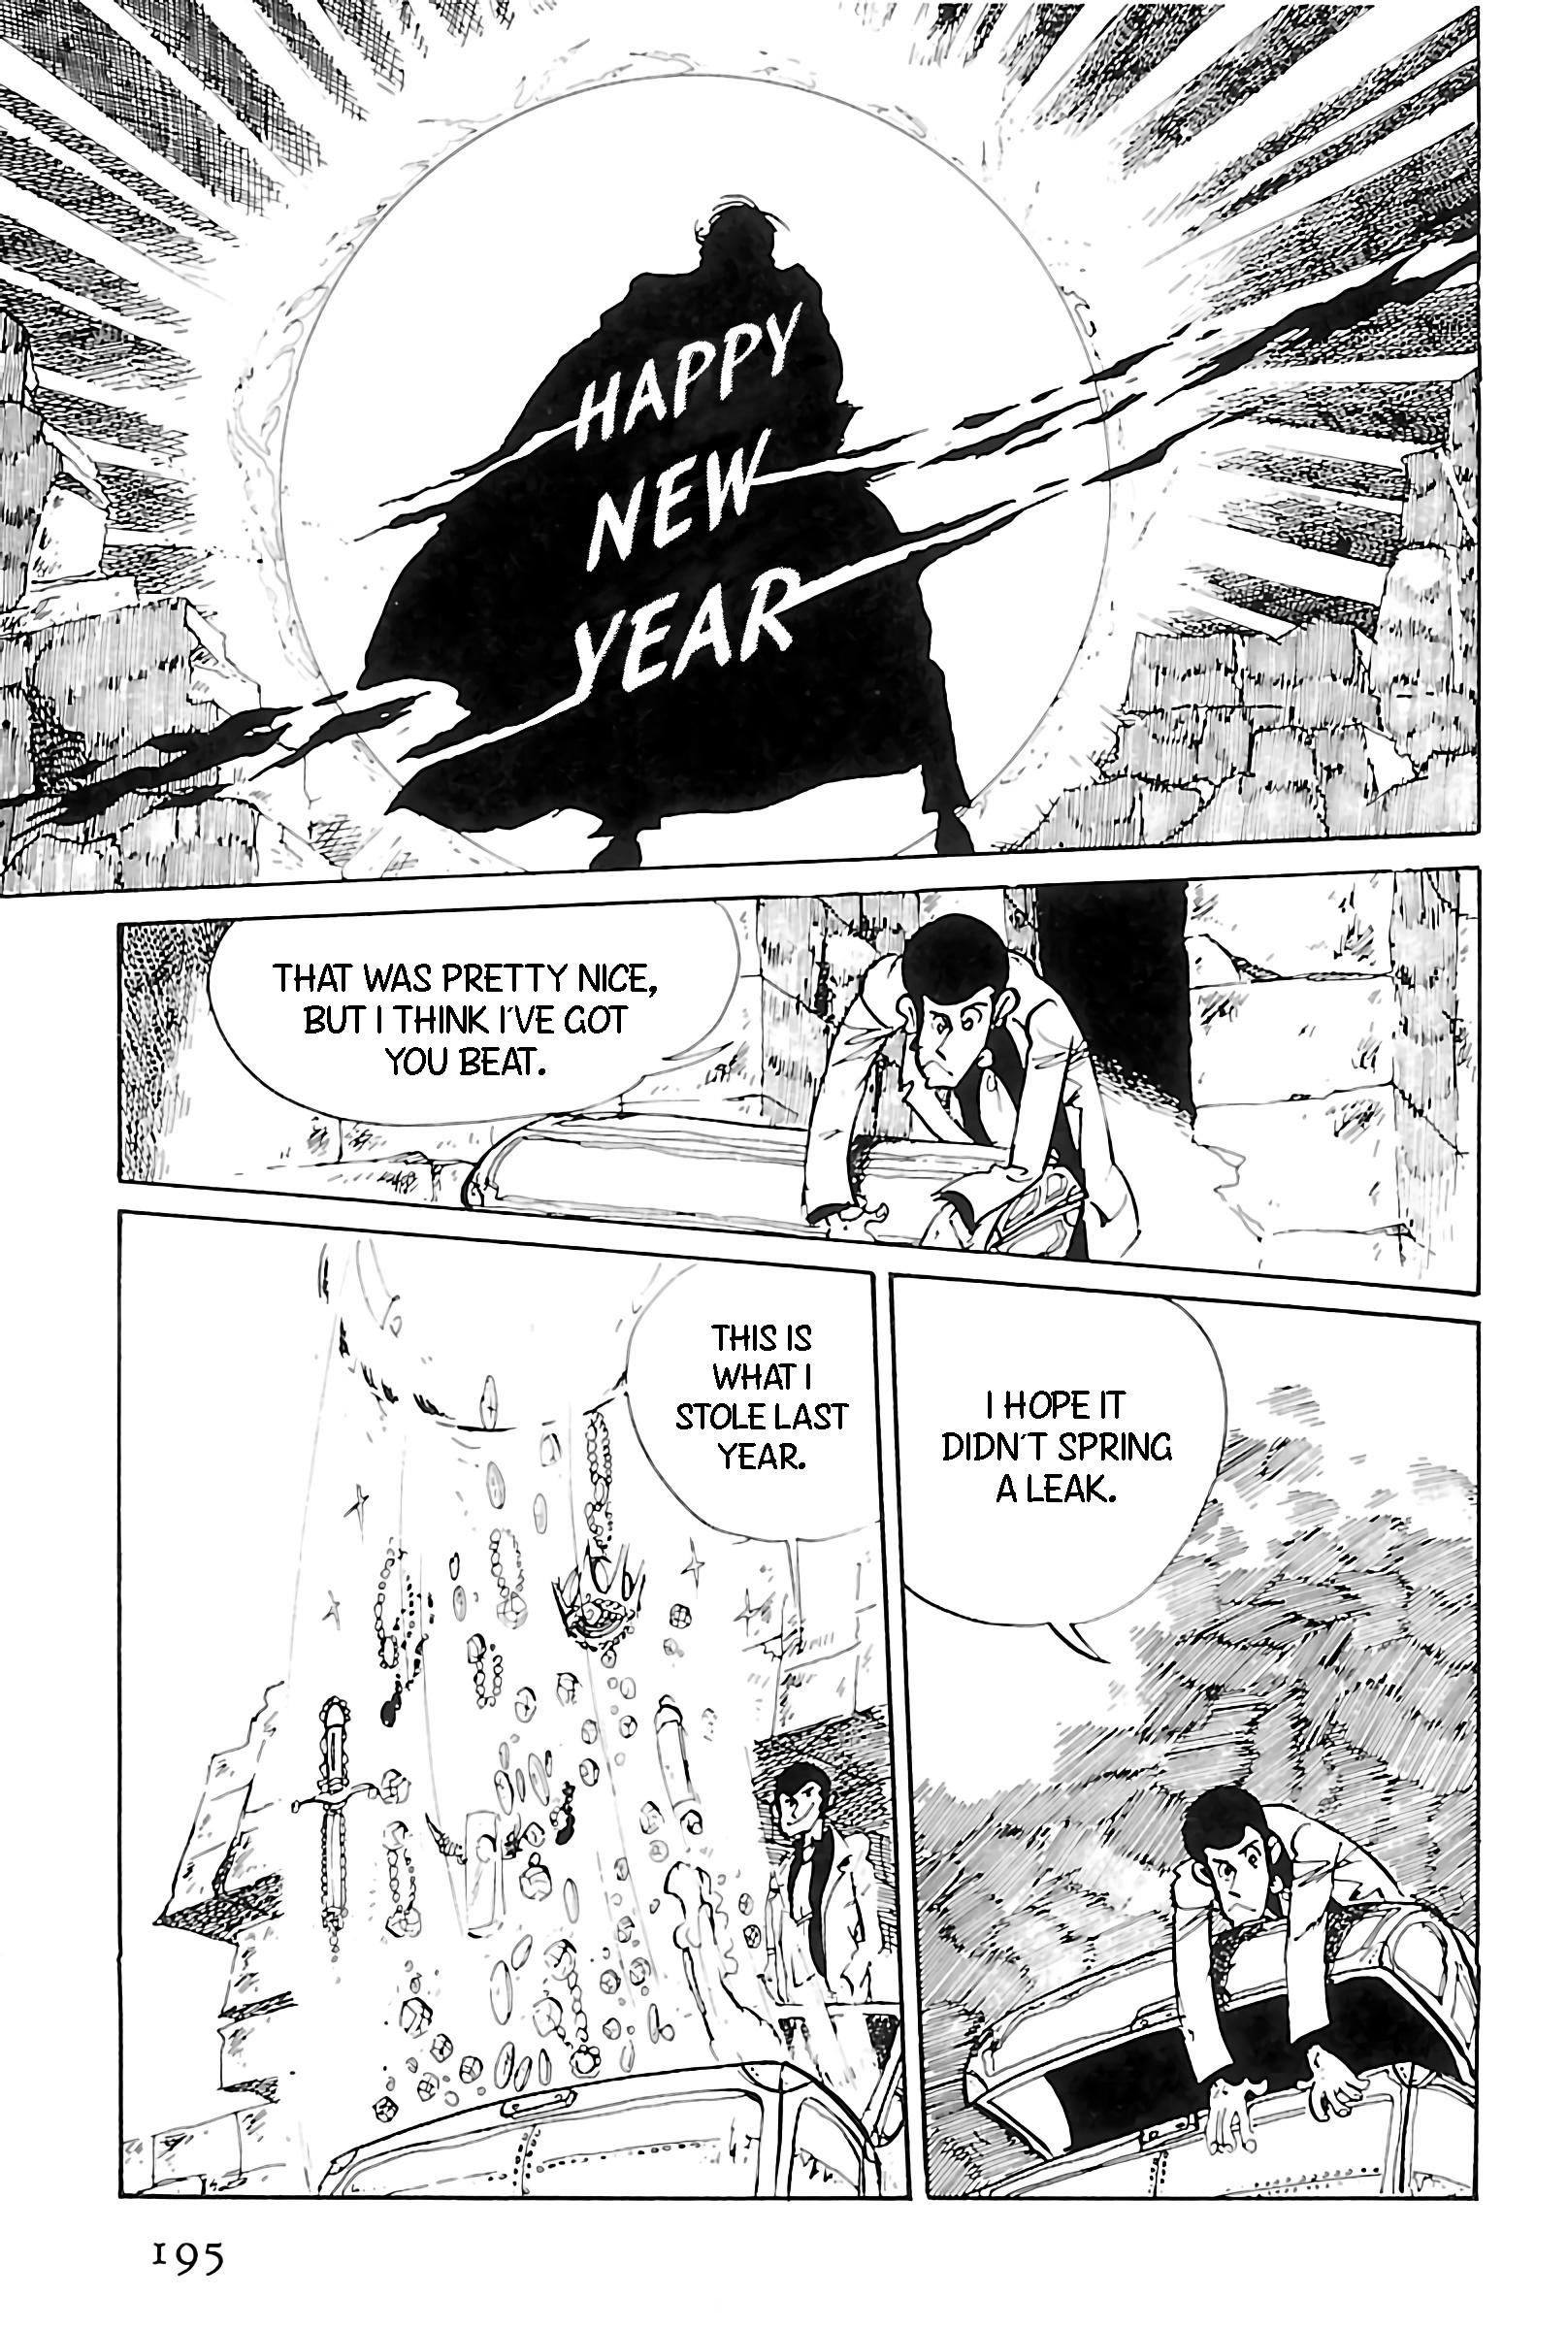 Lupin Iii: World'S Most Wanted Vol.11 Chapter 124: Happy New Year, Lupin! page 17 - Mangakakalots.com